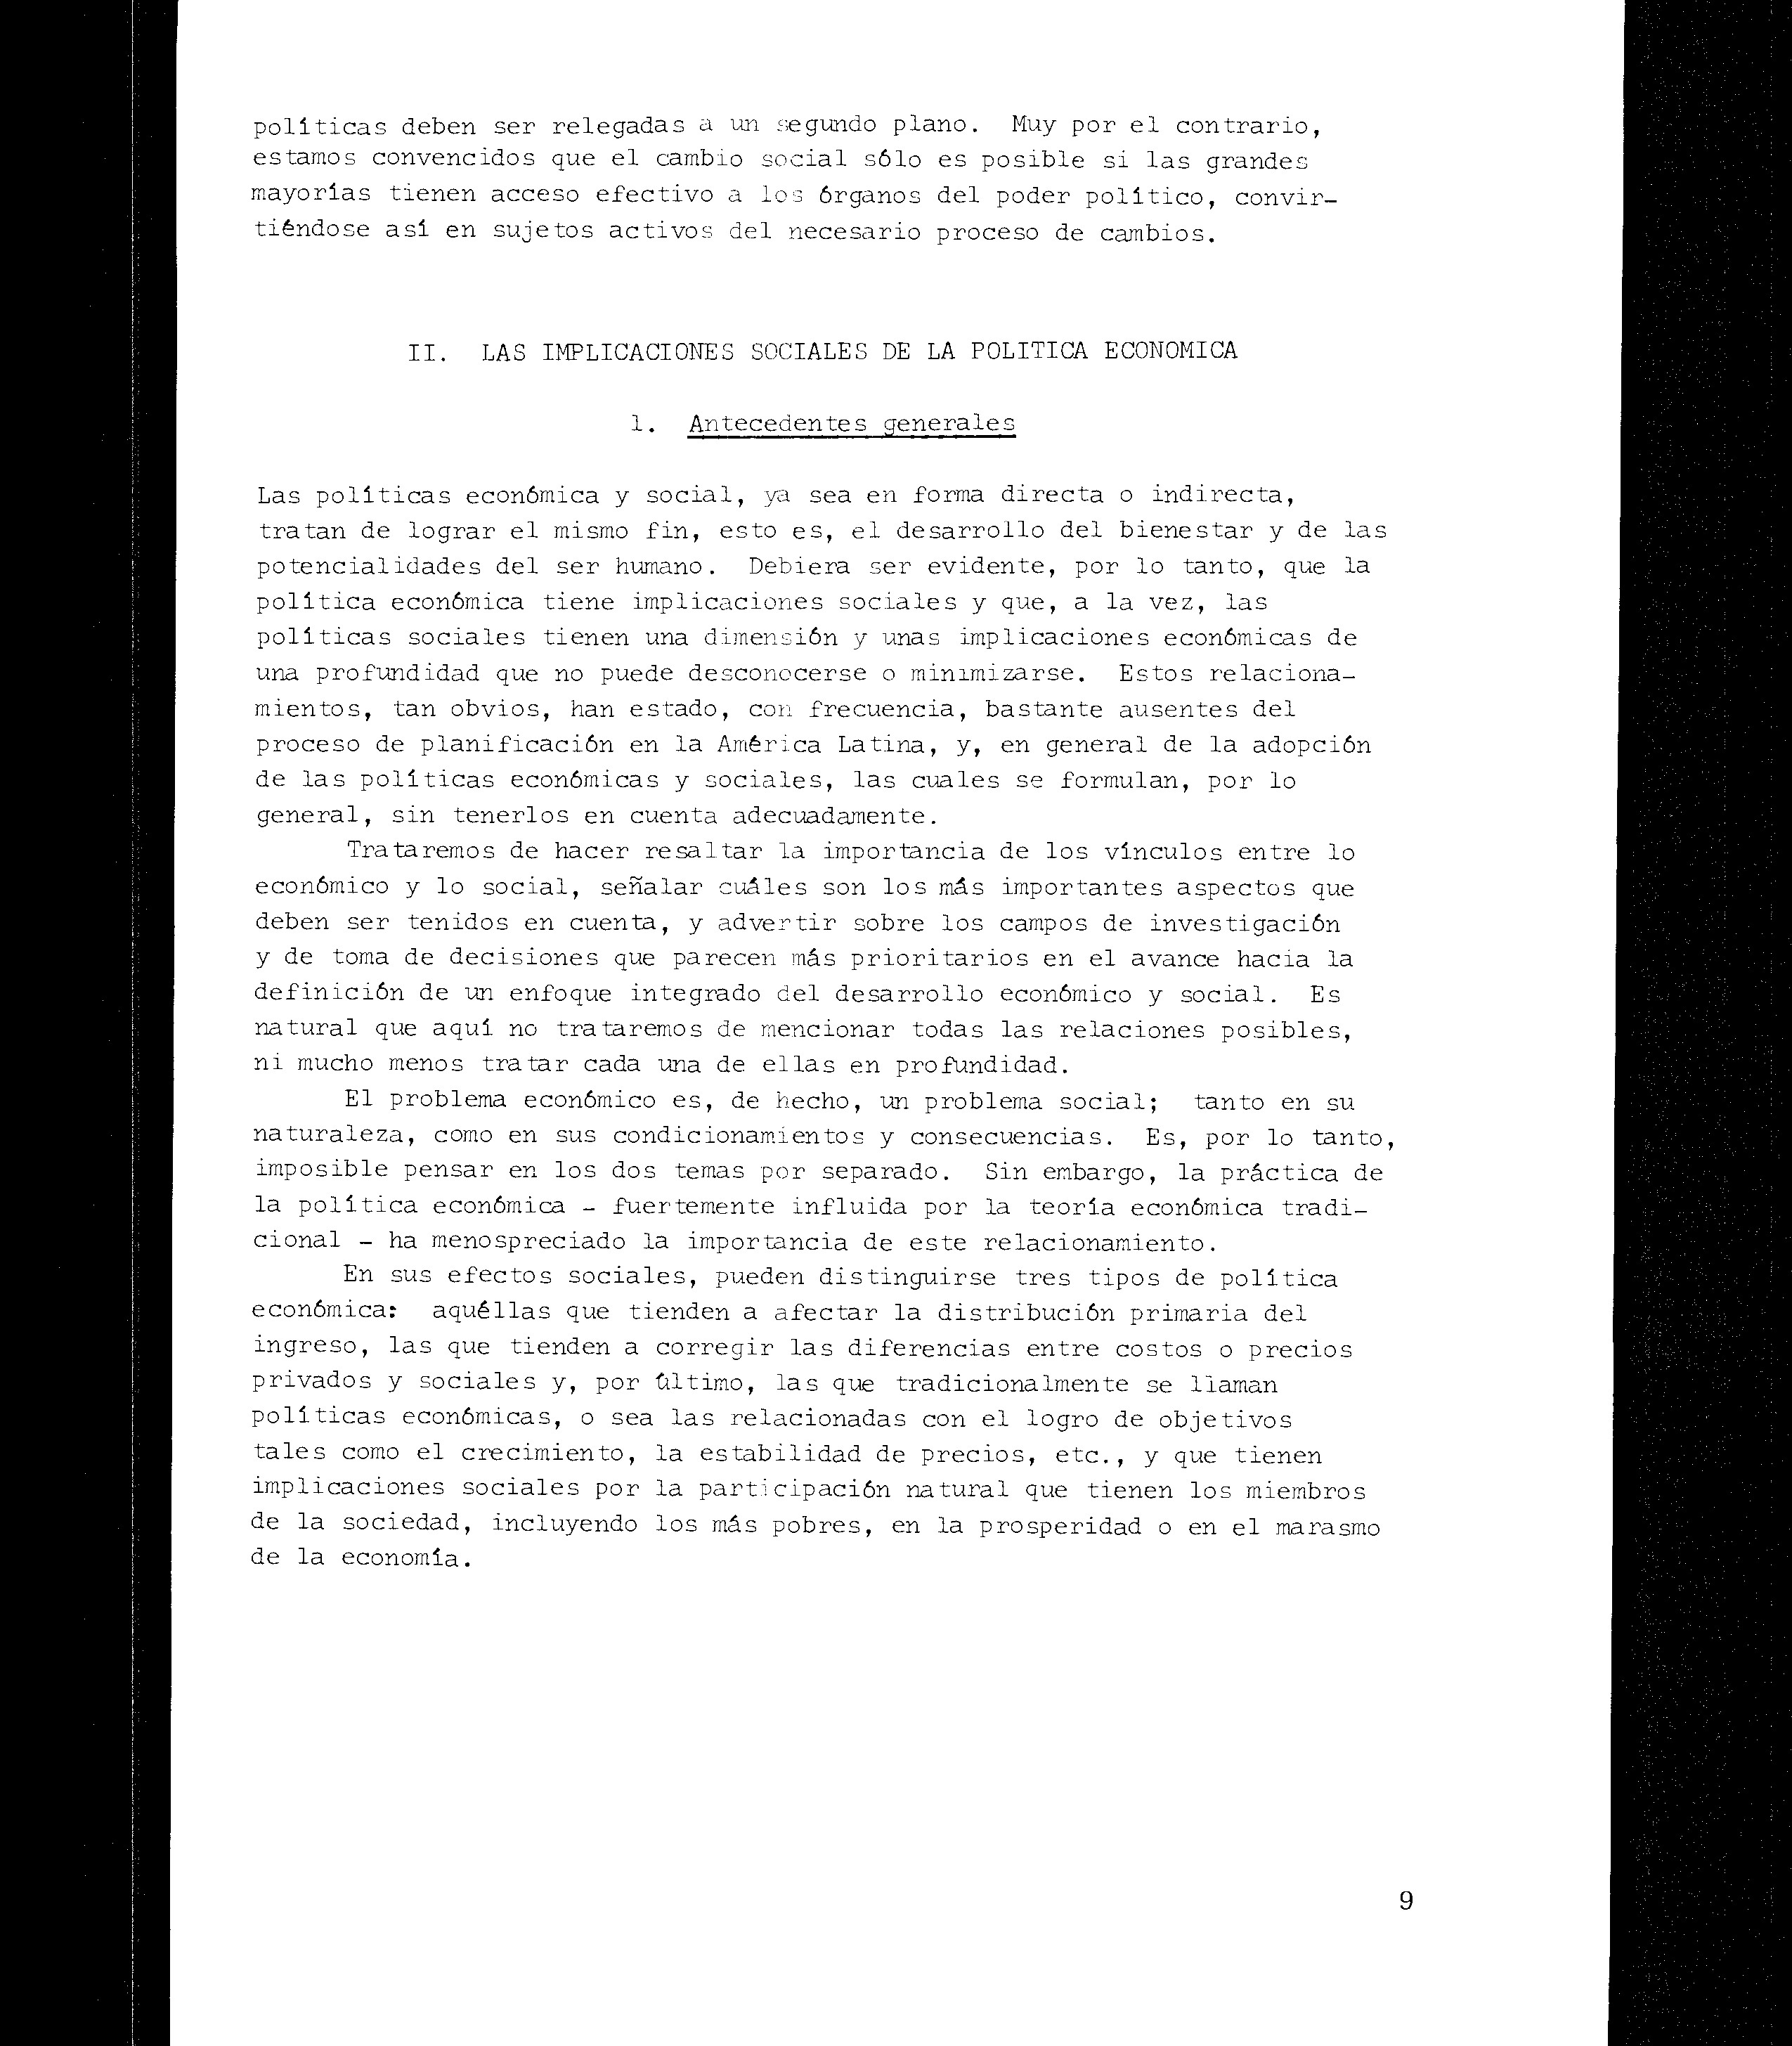 Calendario Lunar Febrero 2019 España Más Recientes Boletin De Planificacion Pdf Of Calendario Lunar Febrero 2019 España Recientes Hilo De Internet [archivo] foros De Economa Hipotecas Y Bolsa